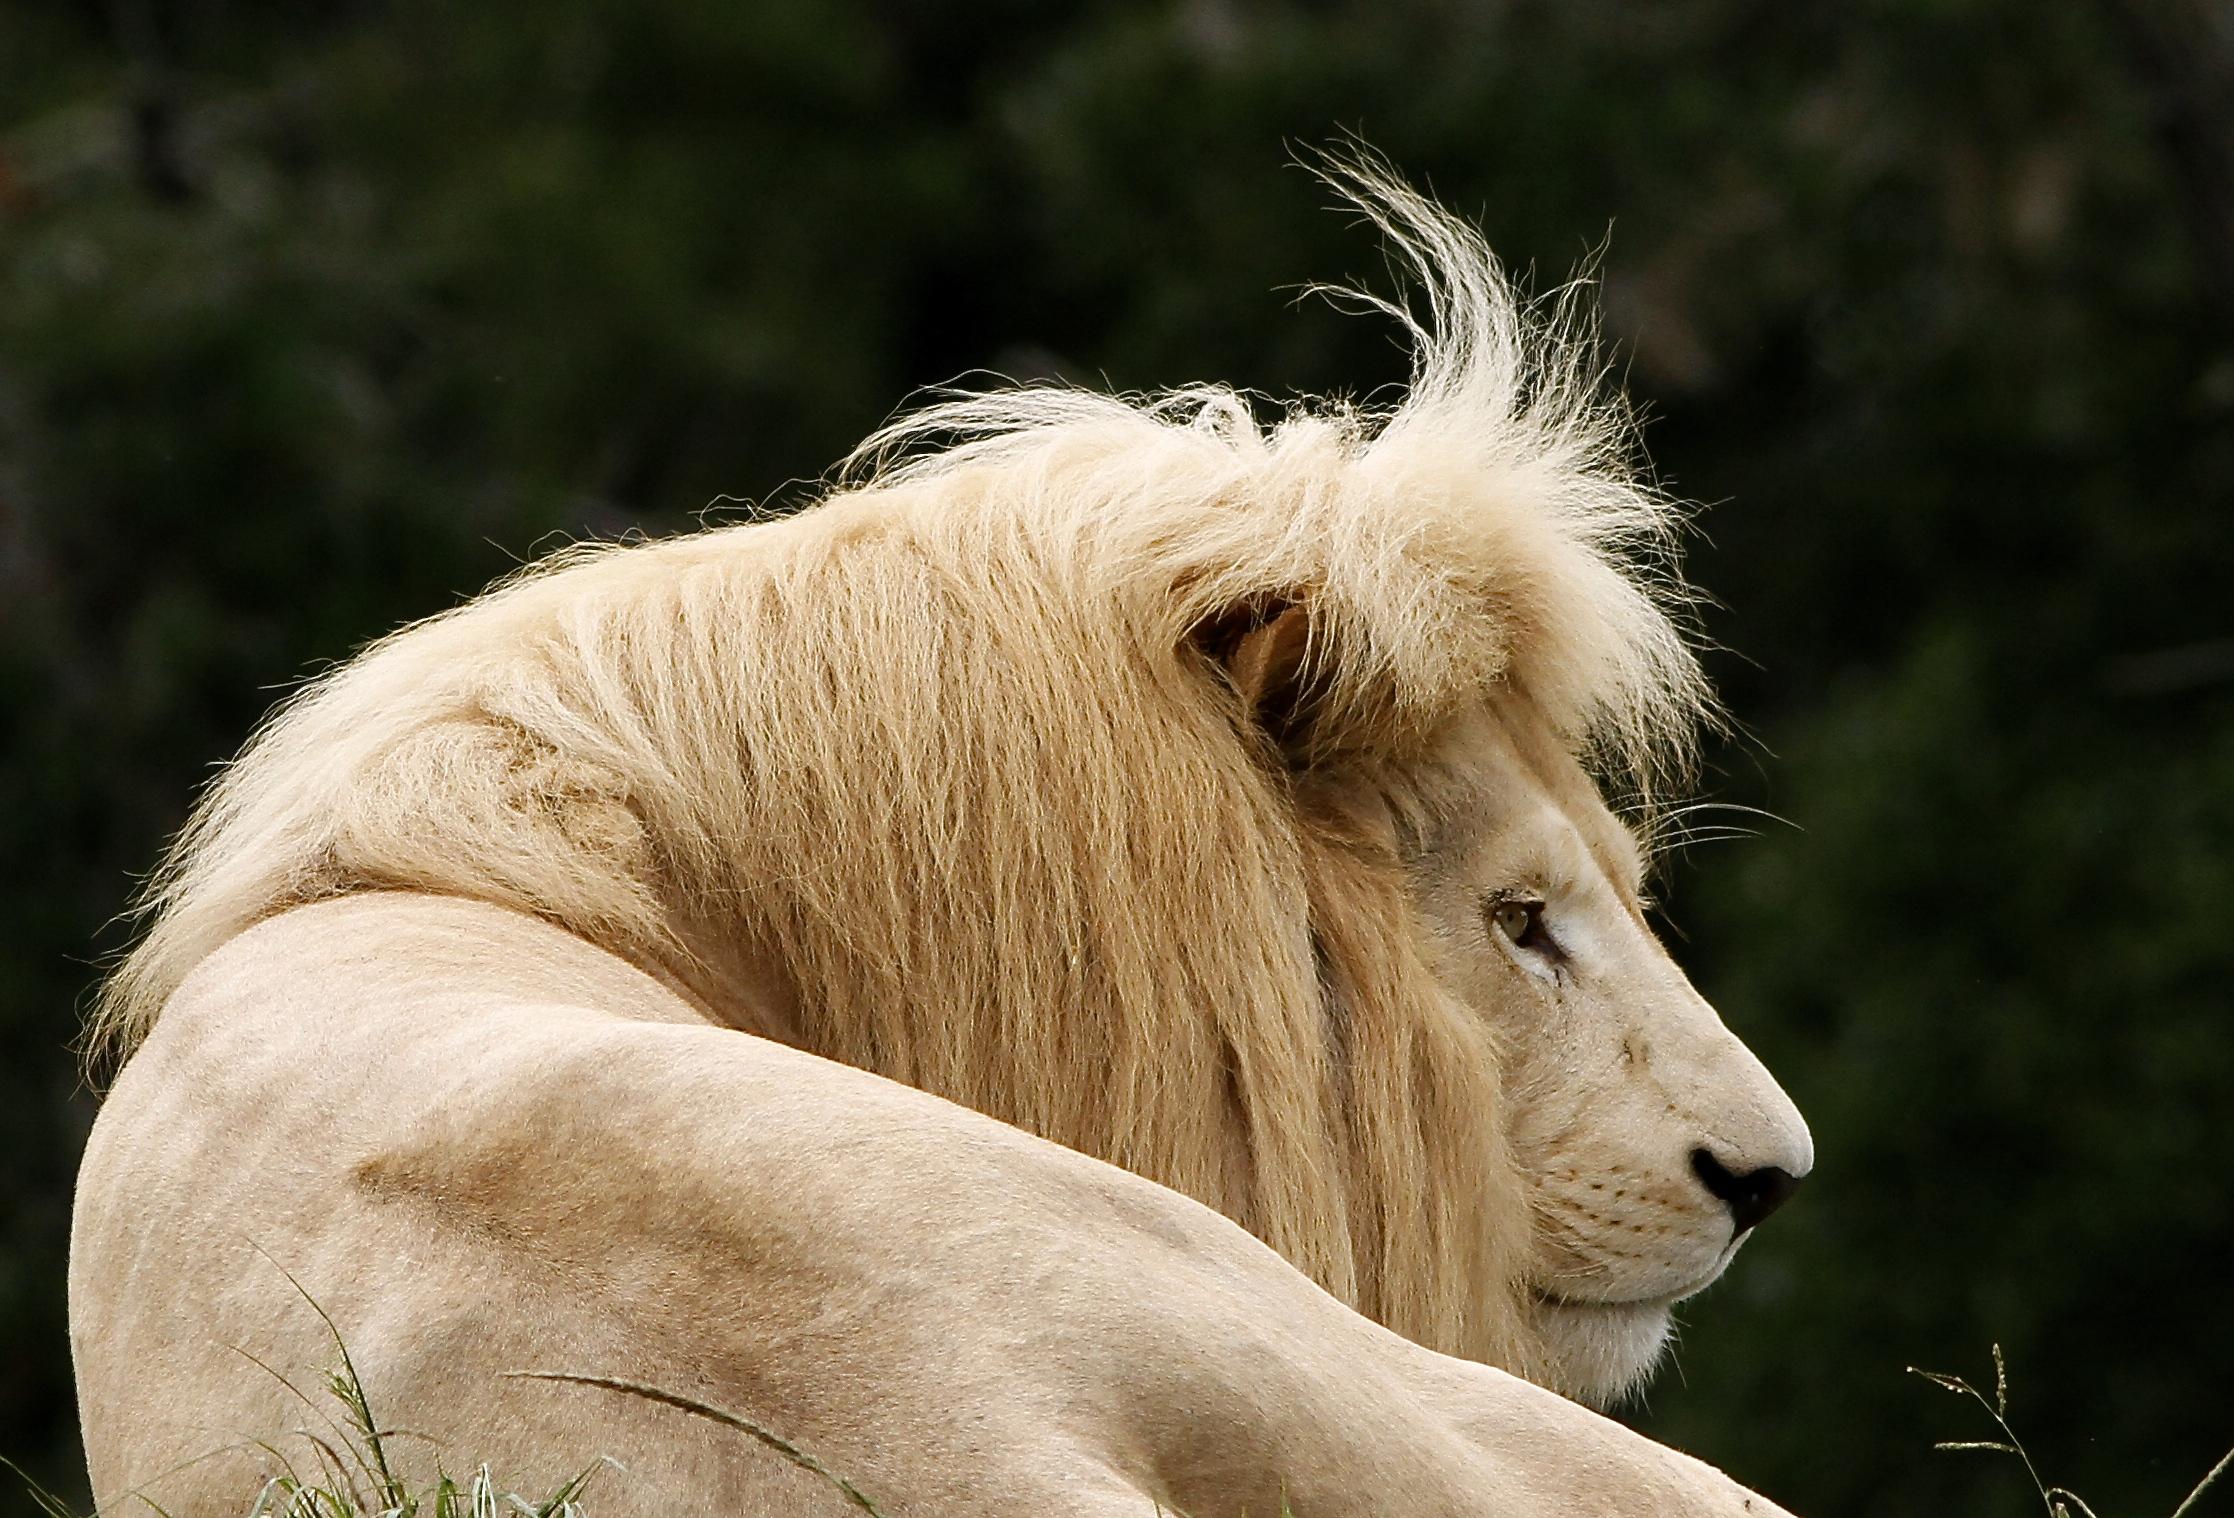 https://www.sirplett.co.za/userfiles/images/Check-that-fringe-of-the-White-lion-at-Jukani.JPG